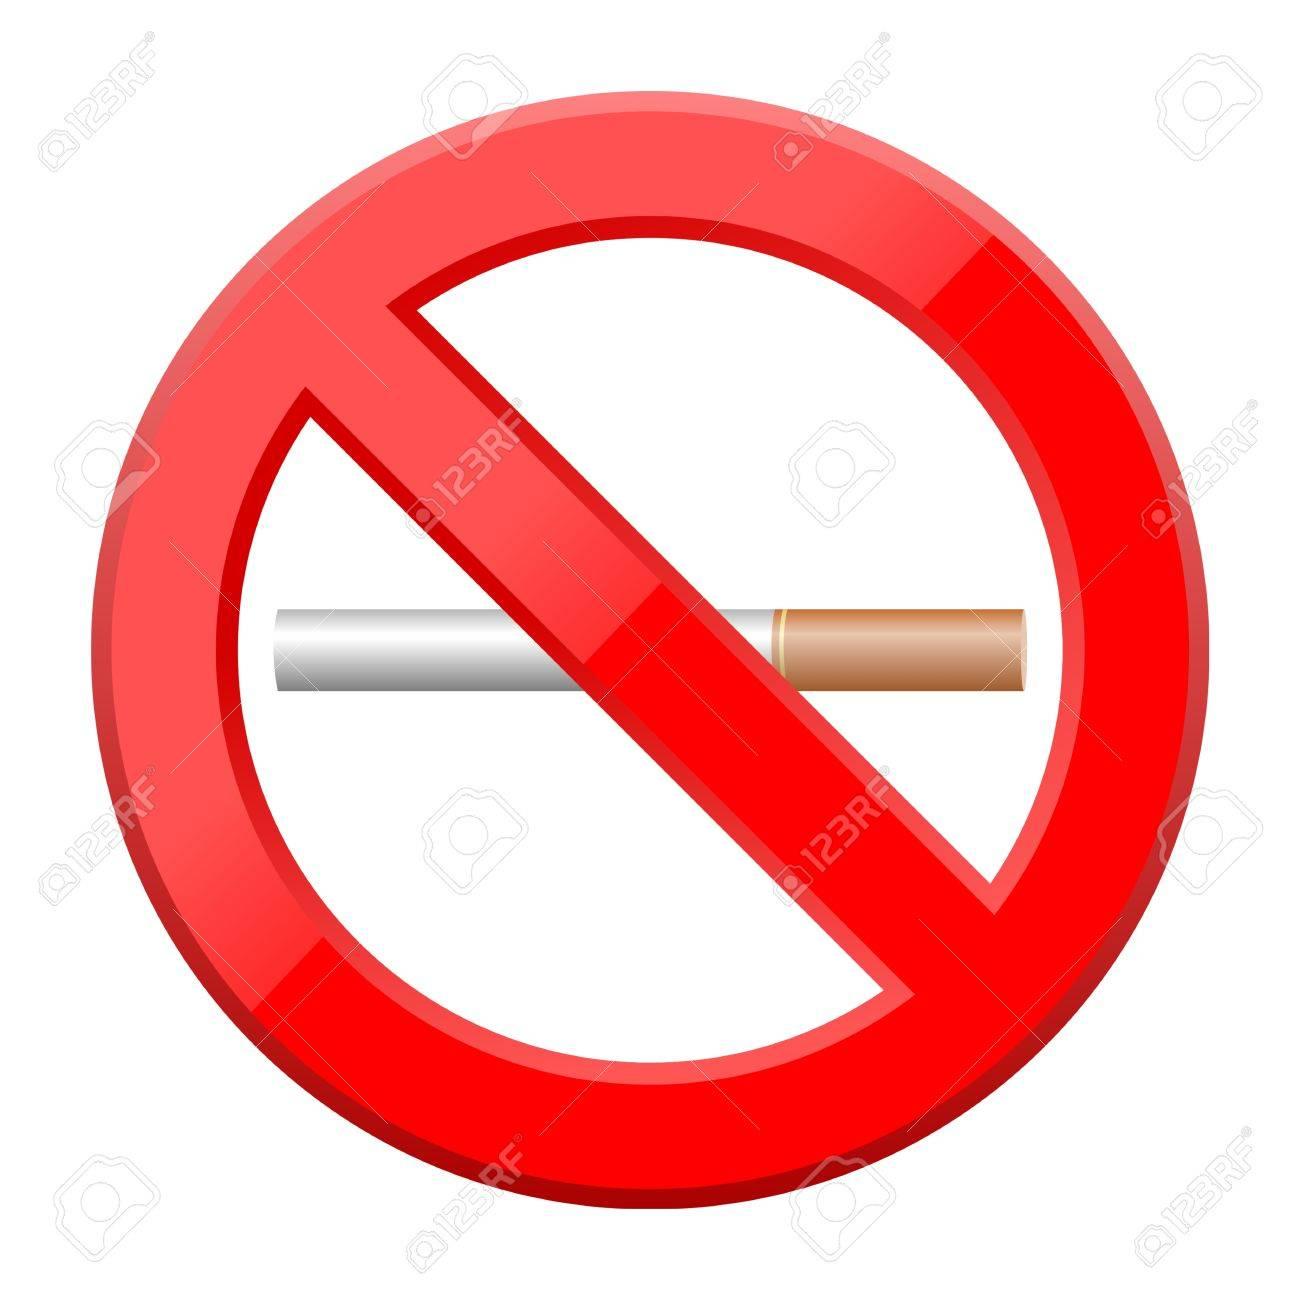 No smoking symbol illustration royalty free cliparts vectors and no smoking symbol illustration stock vector 51872692 biocorpaavc Image collections